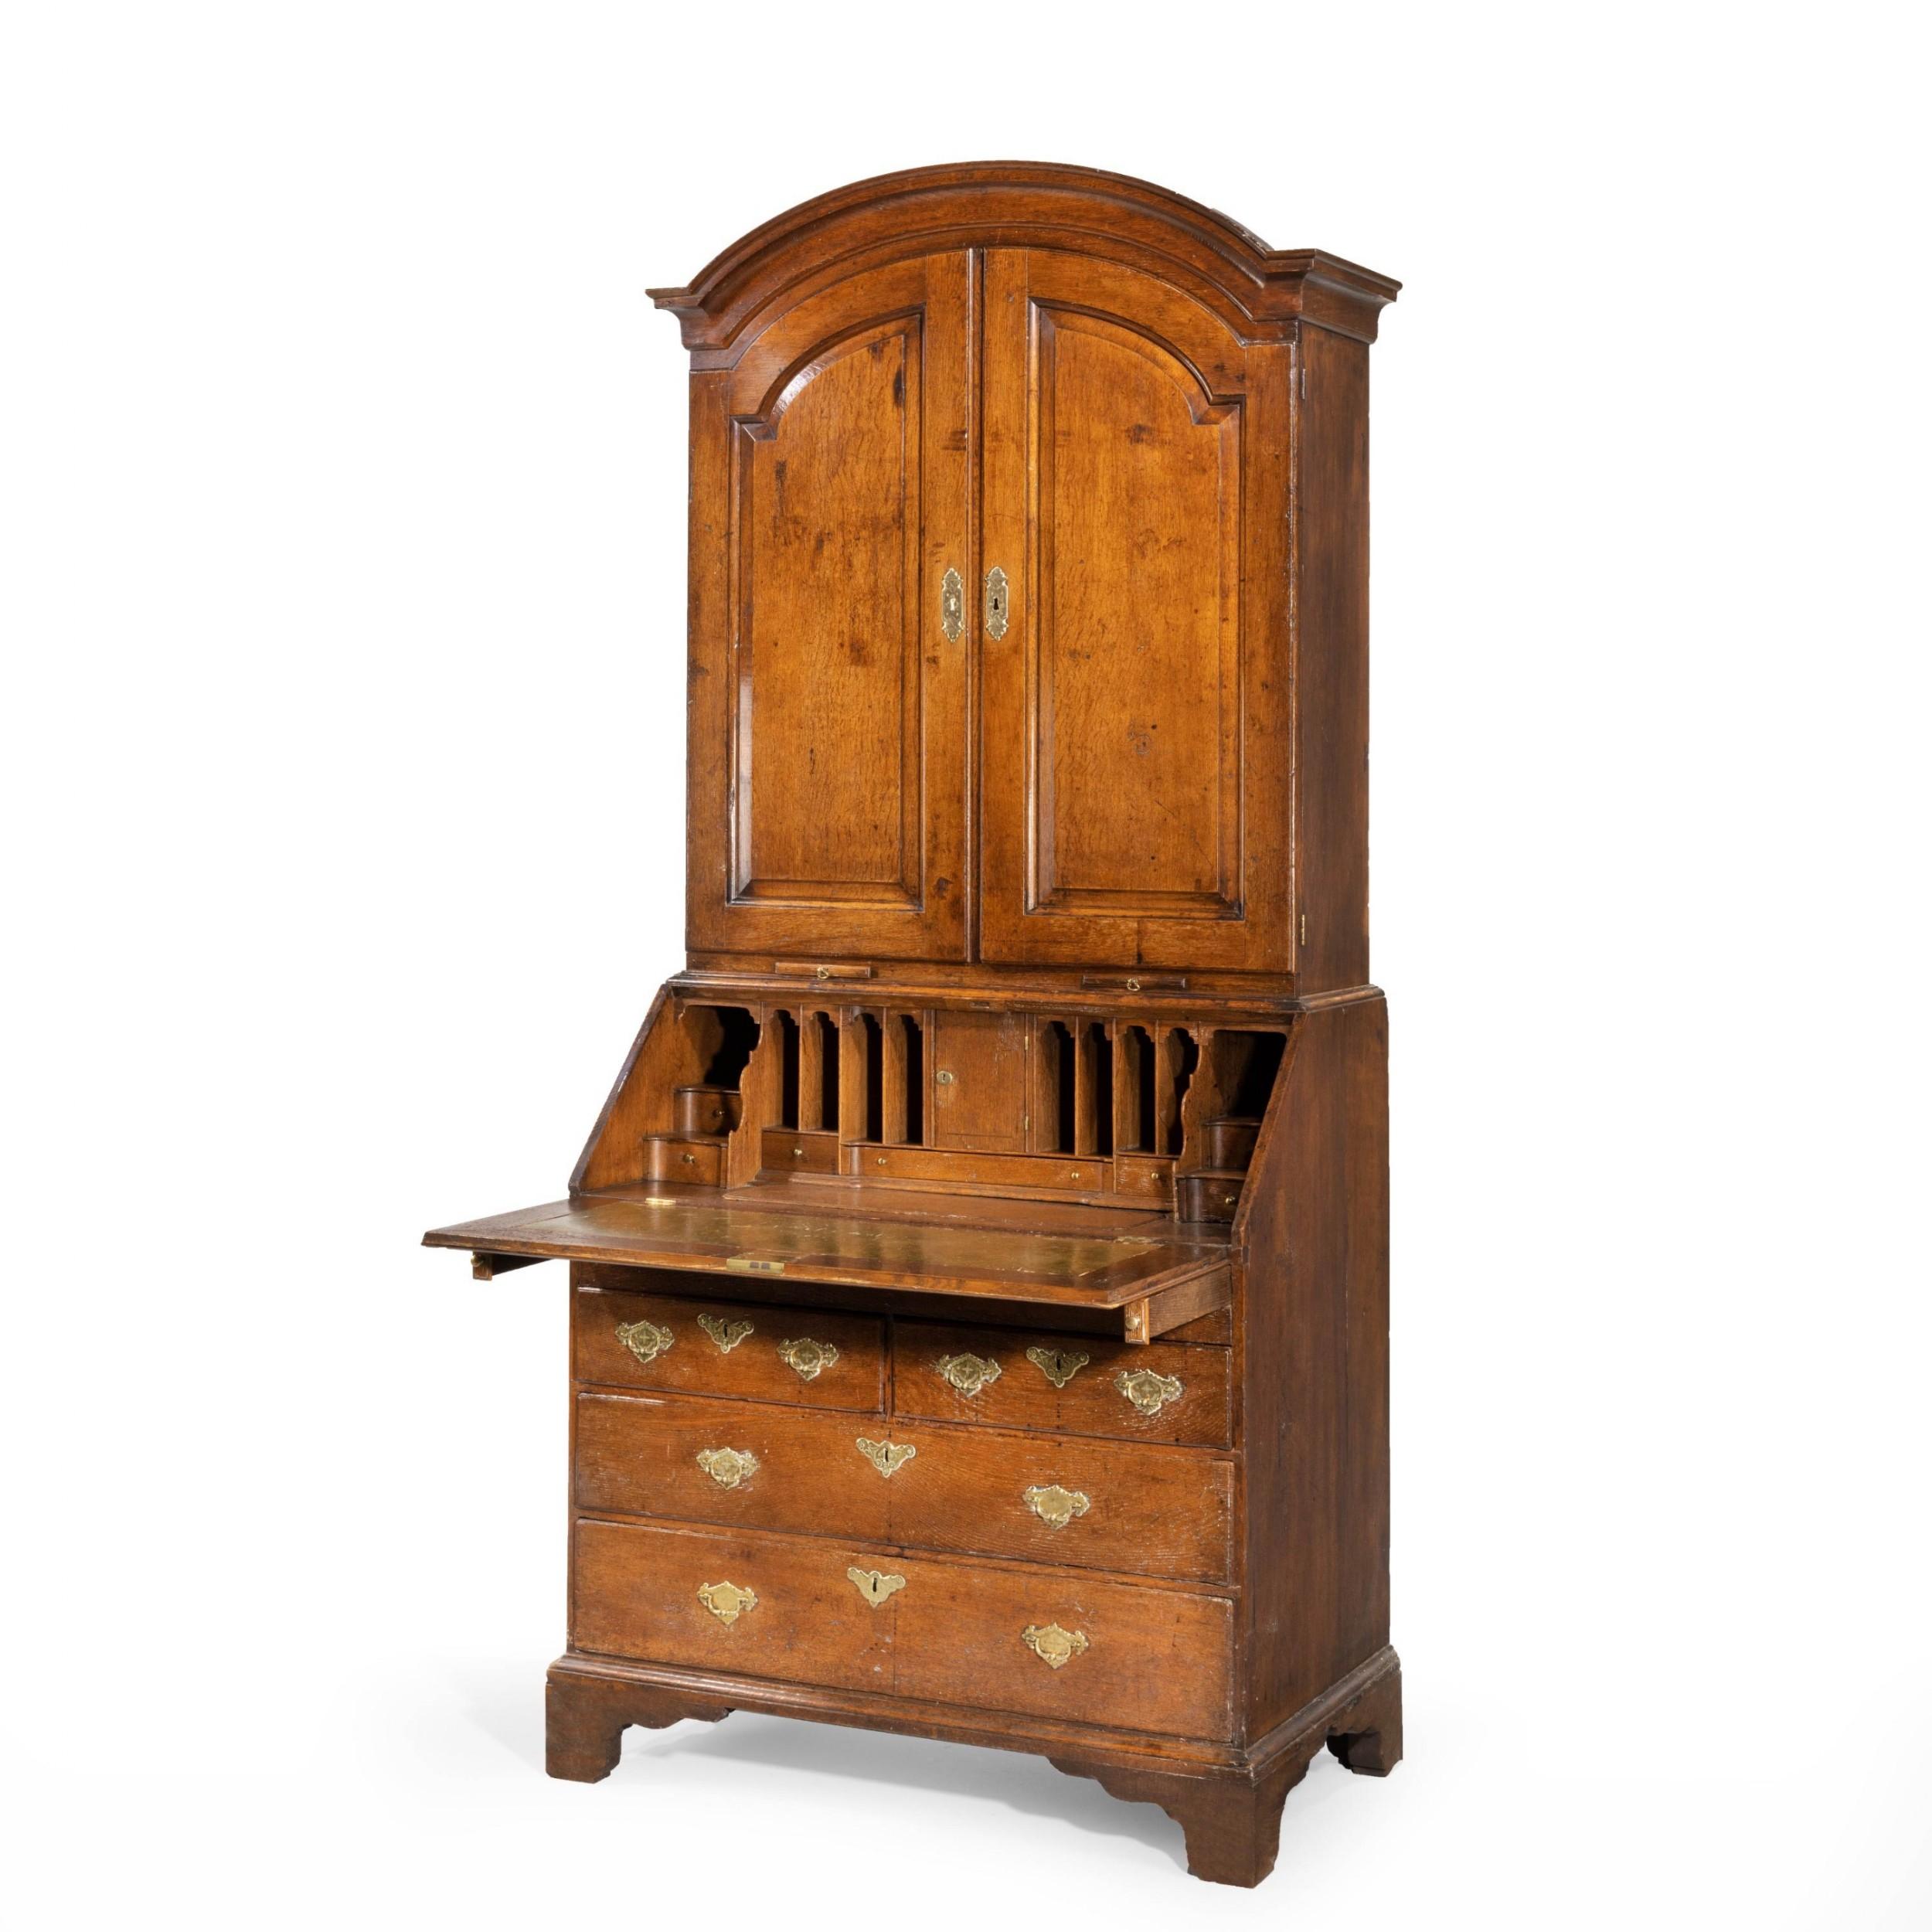 an extremely welldrawn mid 18th century oak bureau cabinet